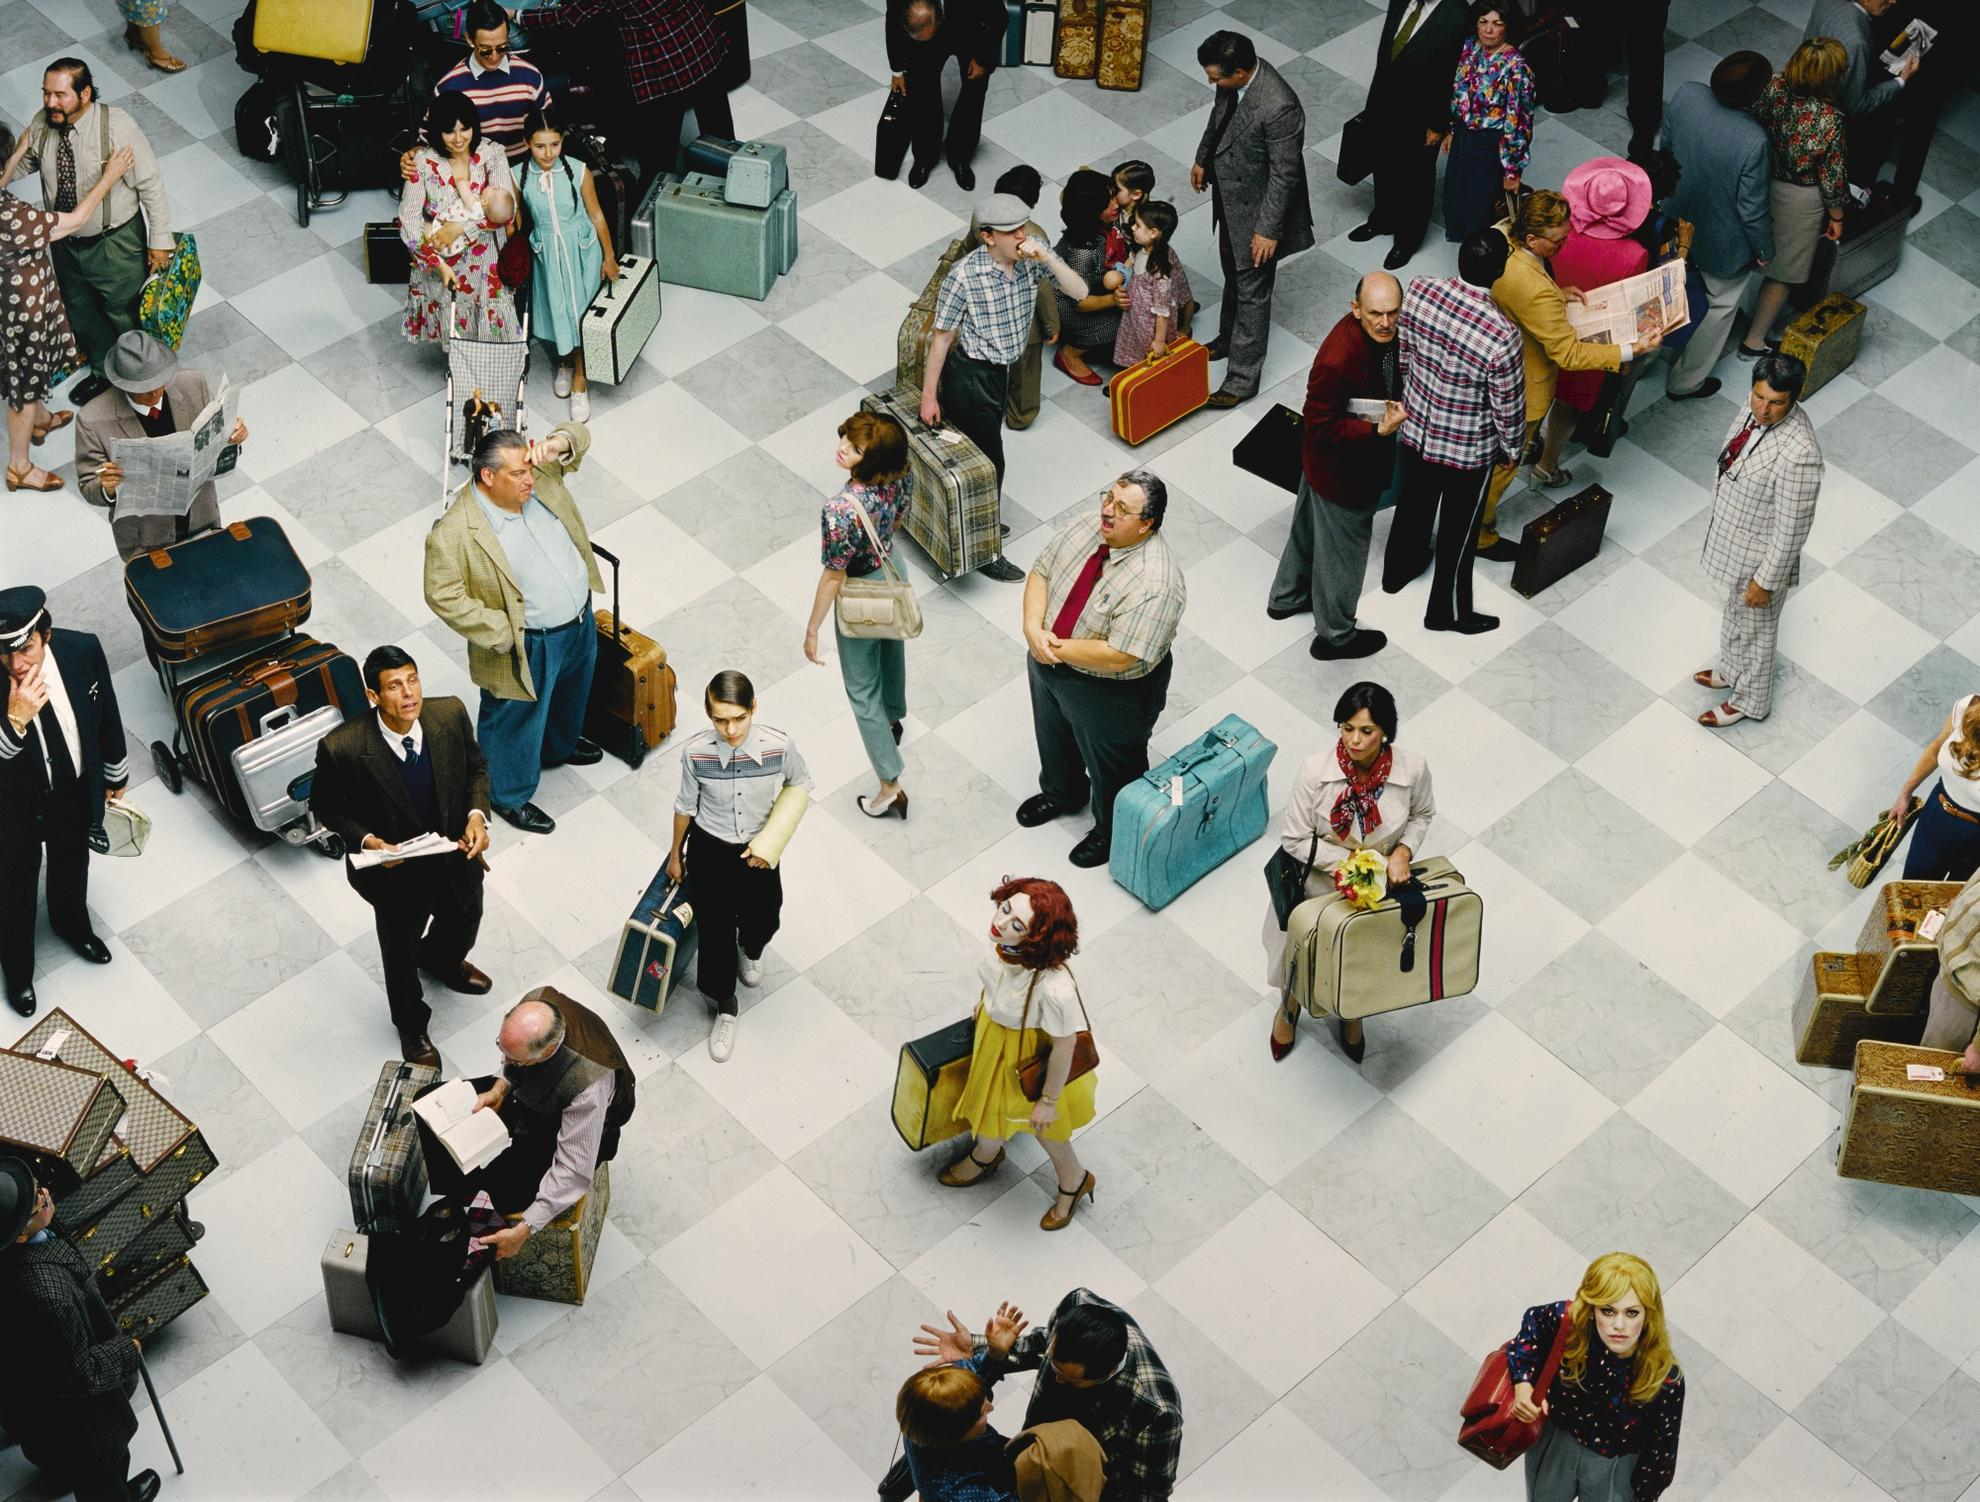 Alex Prager-Crowd #7 (Bob Hope Airport), 2013-2013